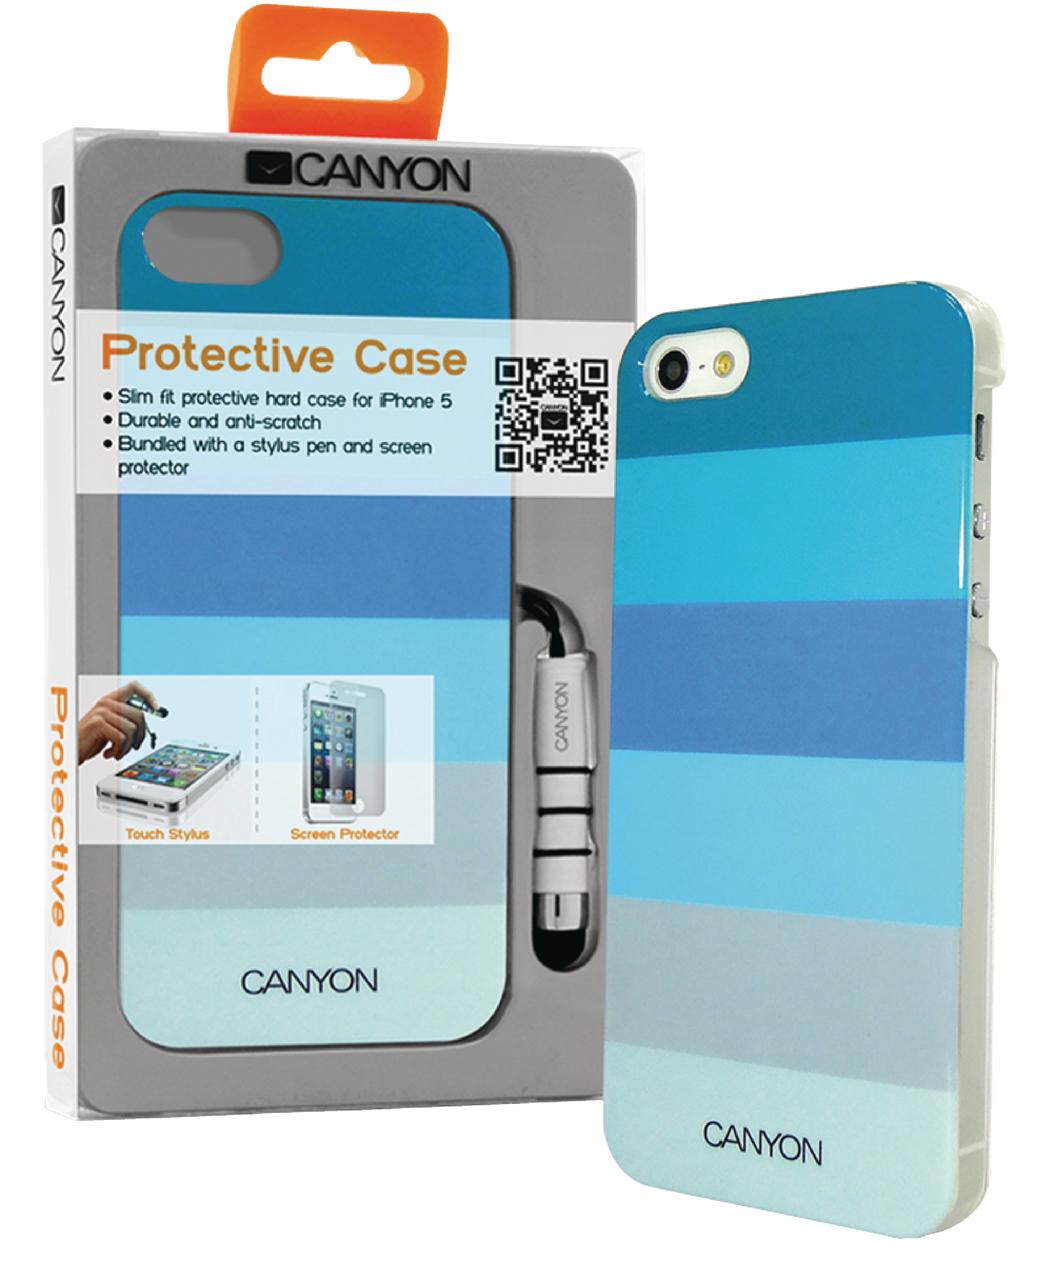 Canyon Cna-i5c02 bl Iphone 5 Hard Cover Case met Stylus en Screen Protector Blauwtinten